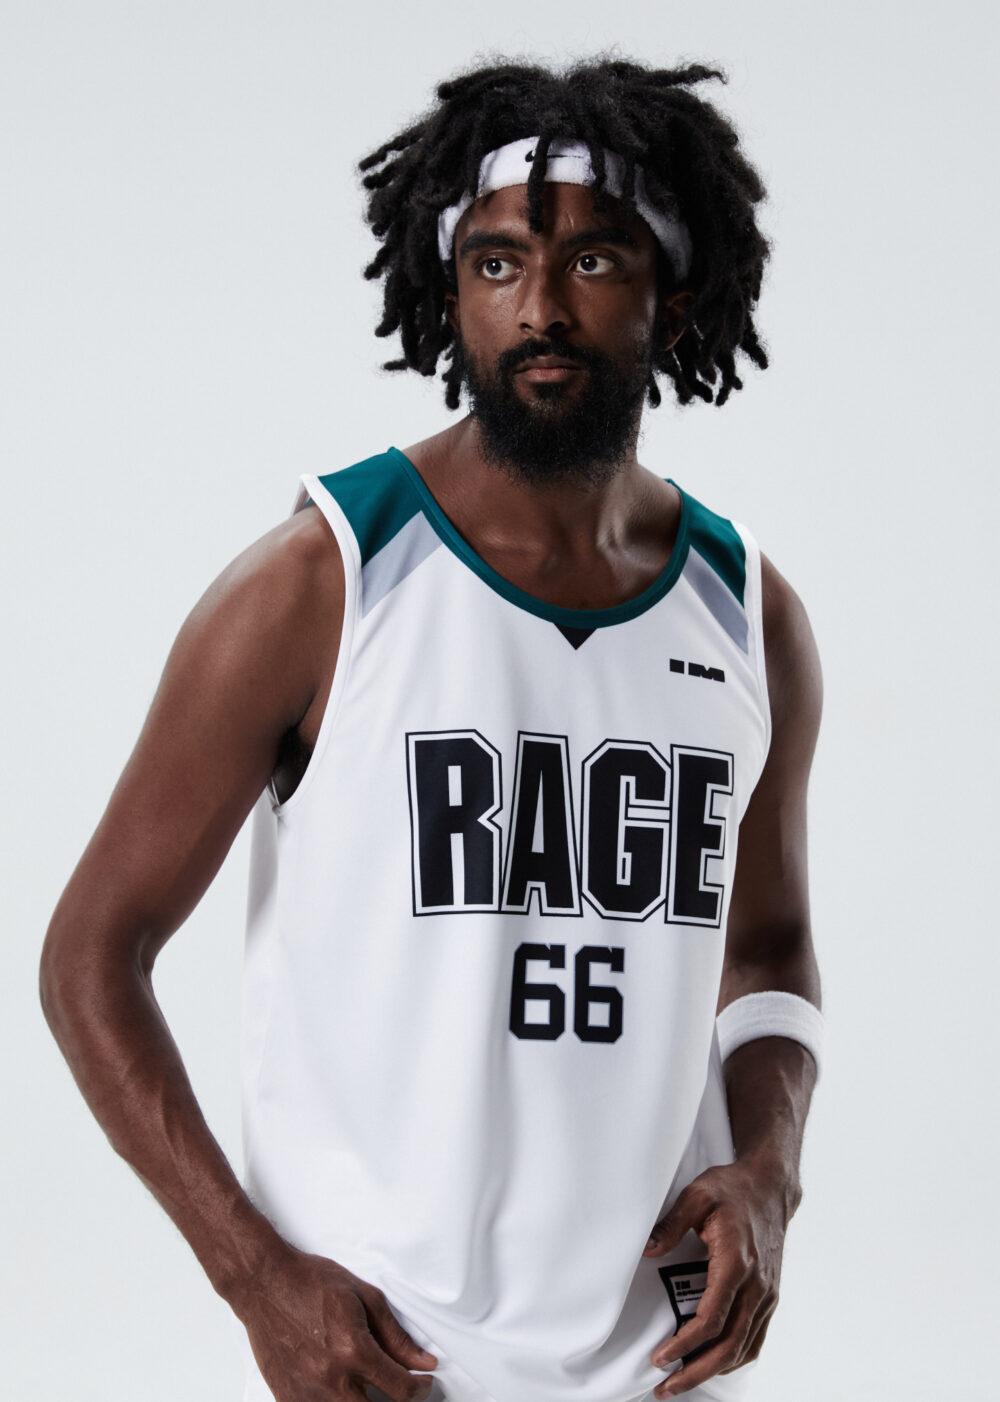 imbc-客製化籃球衣-籃球衣訂做